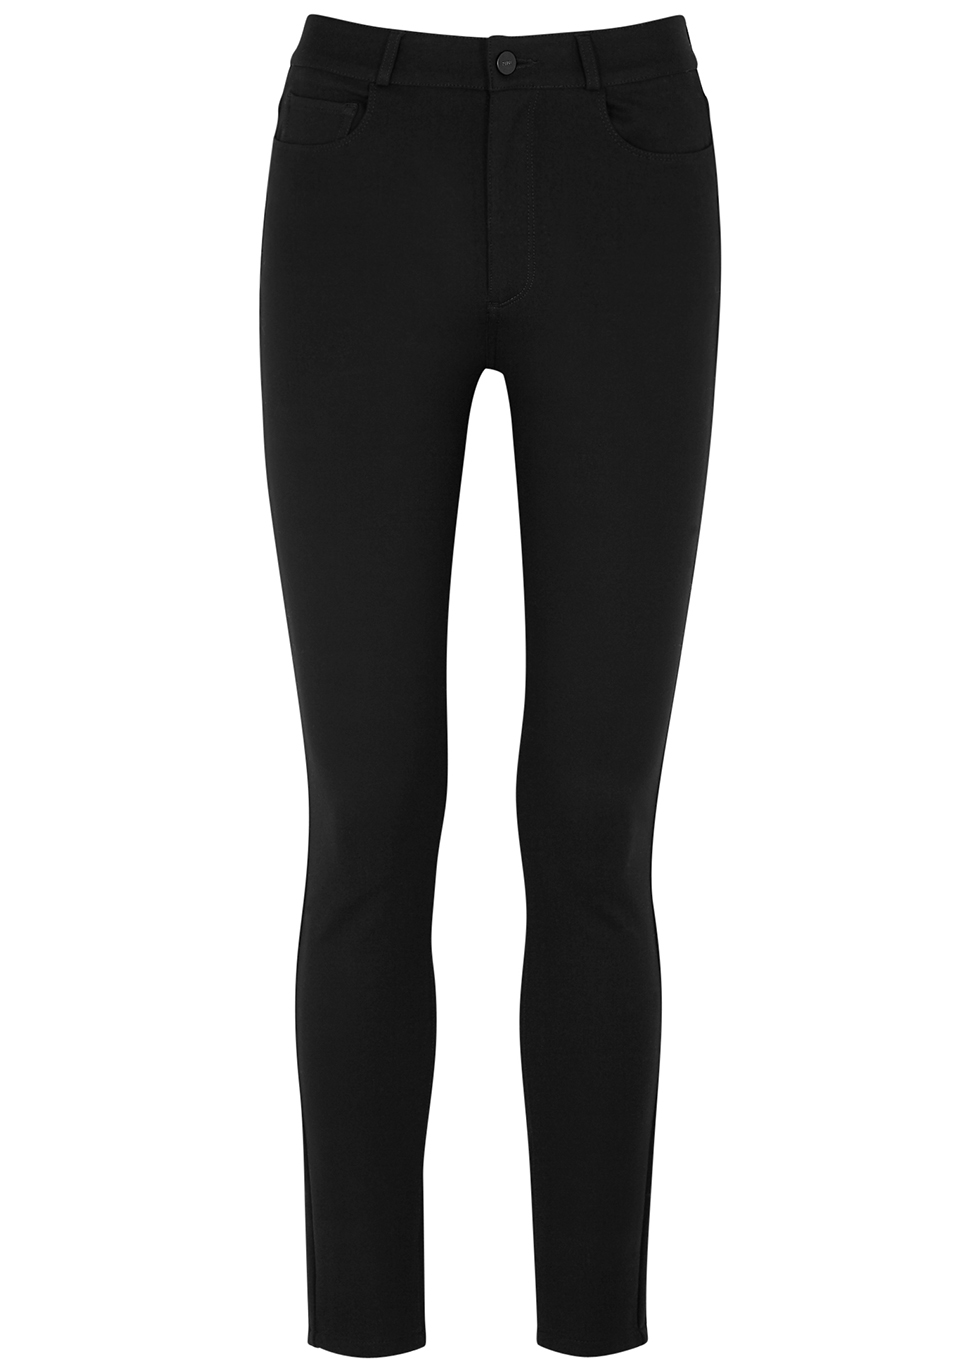 Hoxton Transcend black skinny jeans